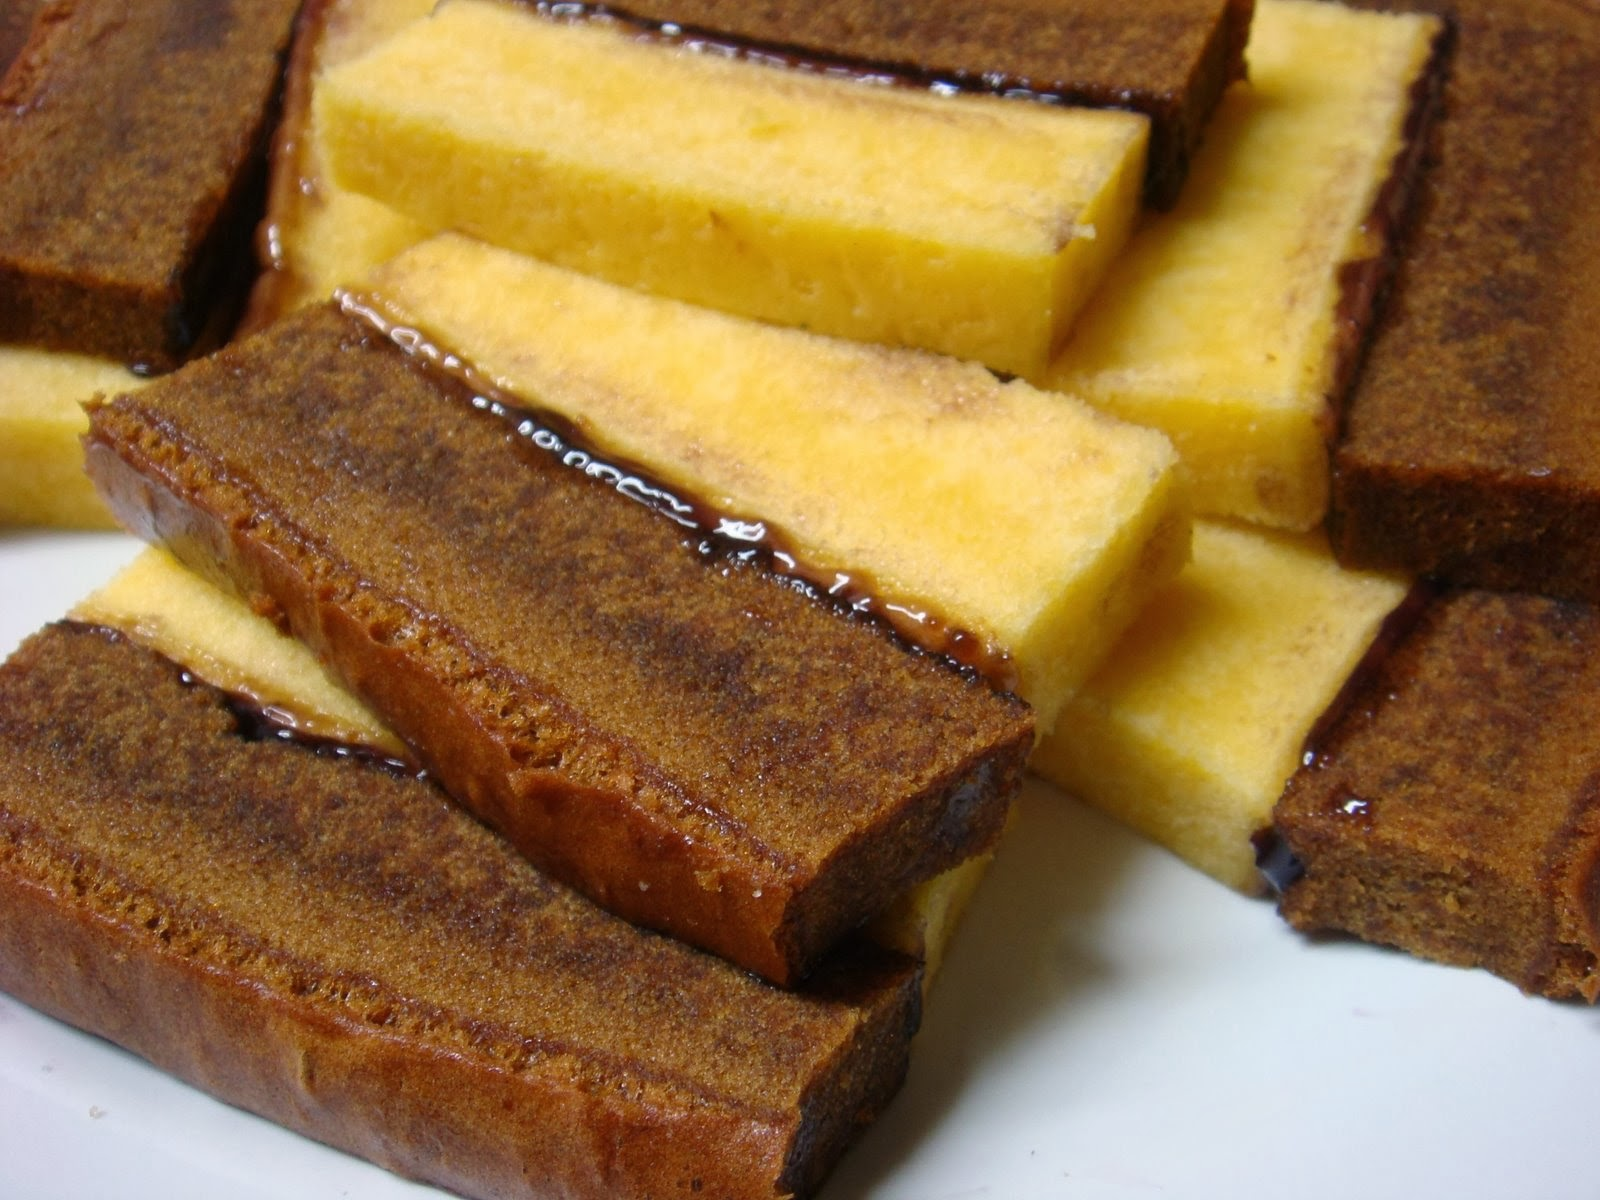 Kue dan masakan resep kue kering basah cake roti 2014 resep kue kering